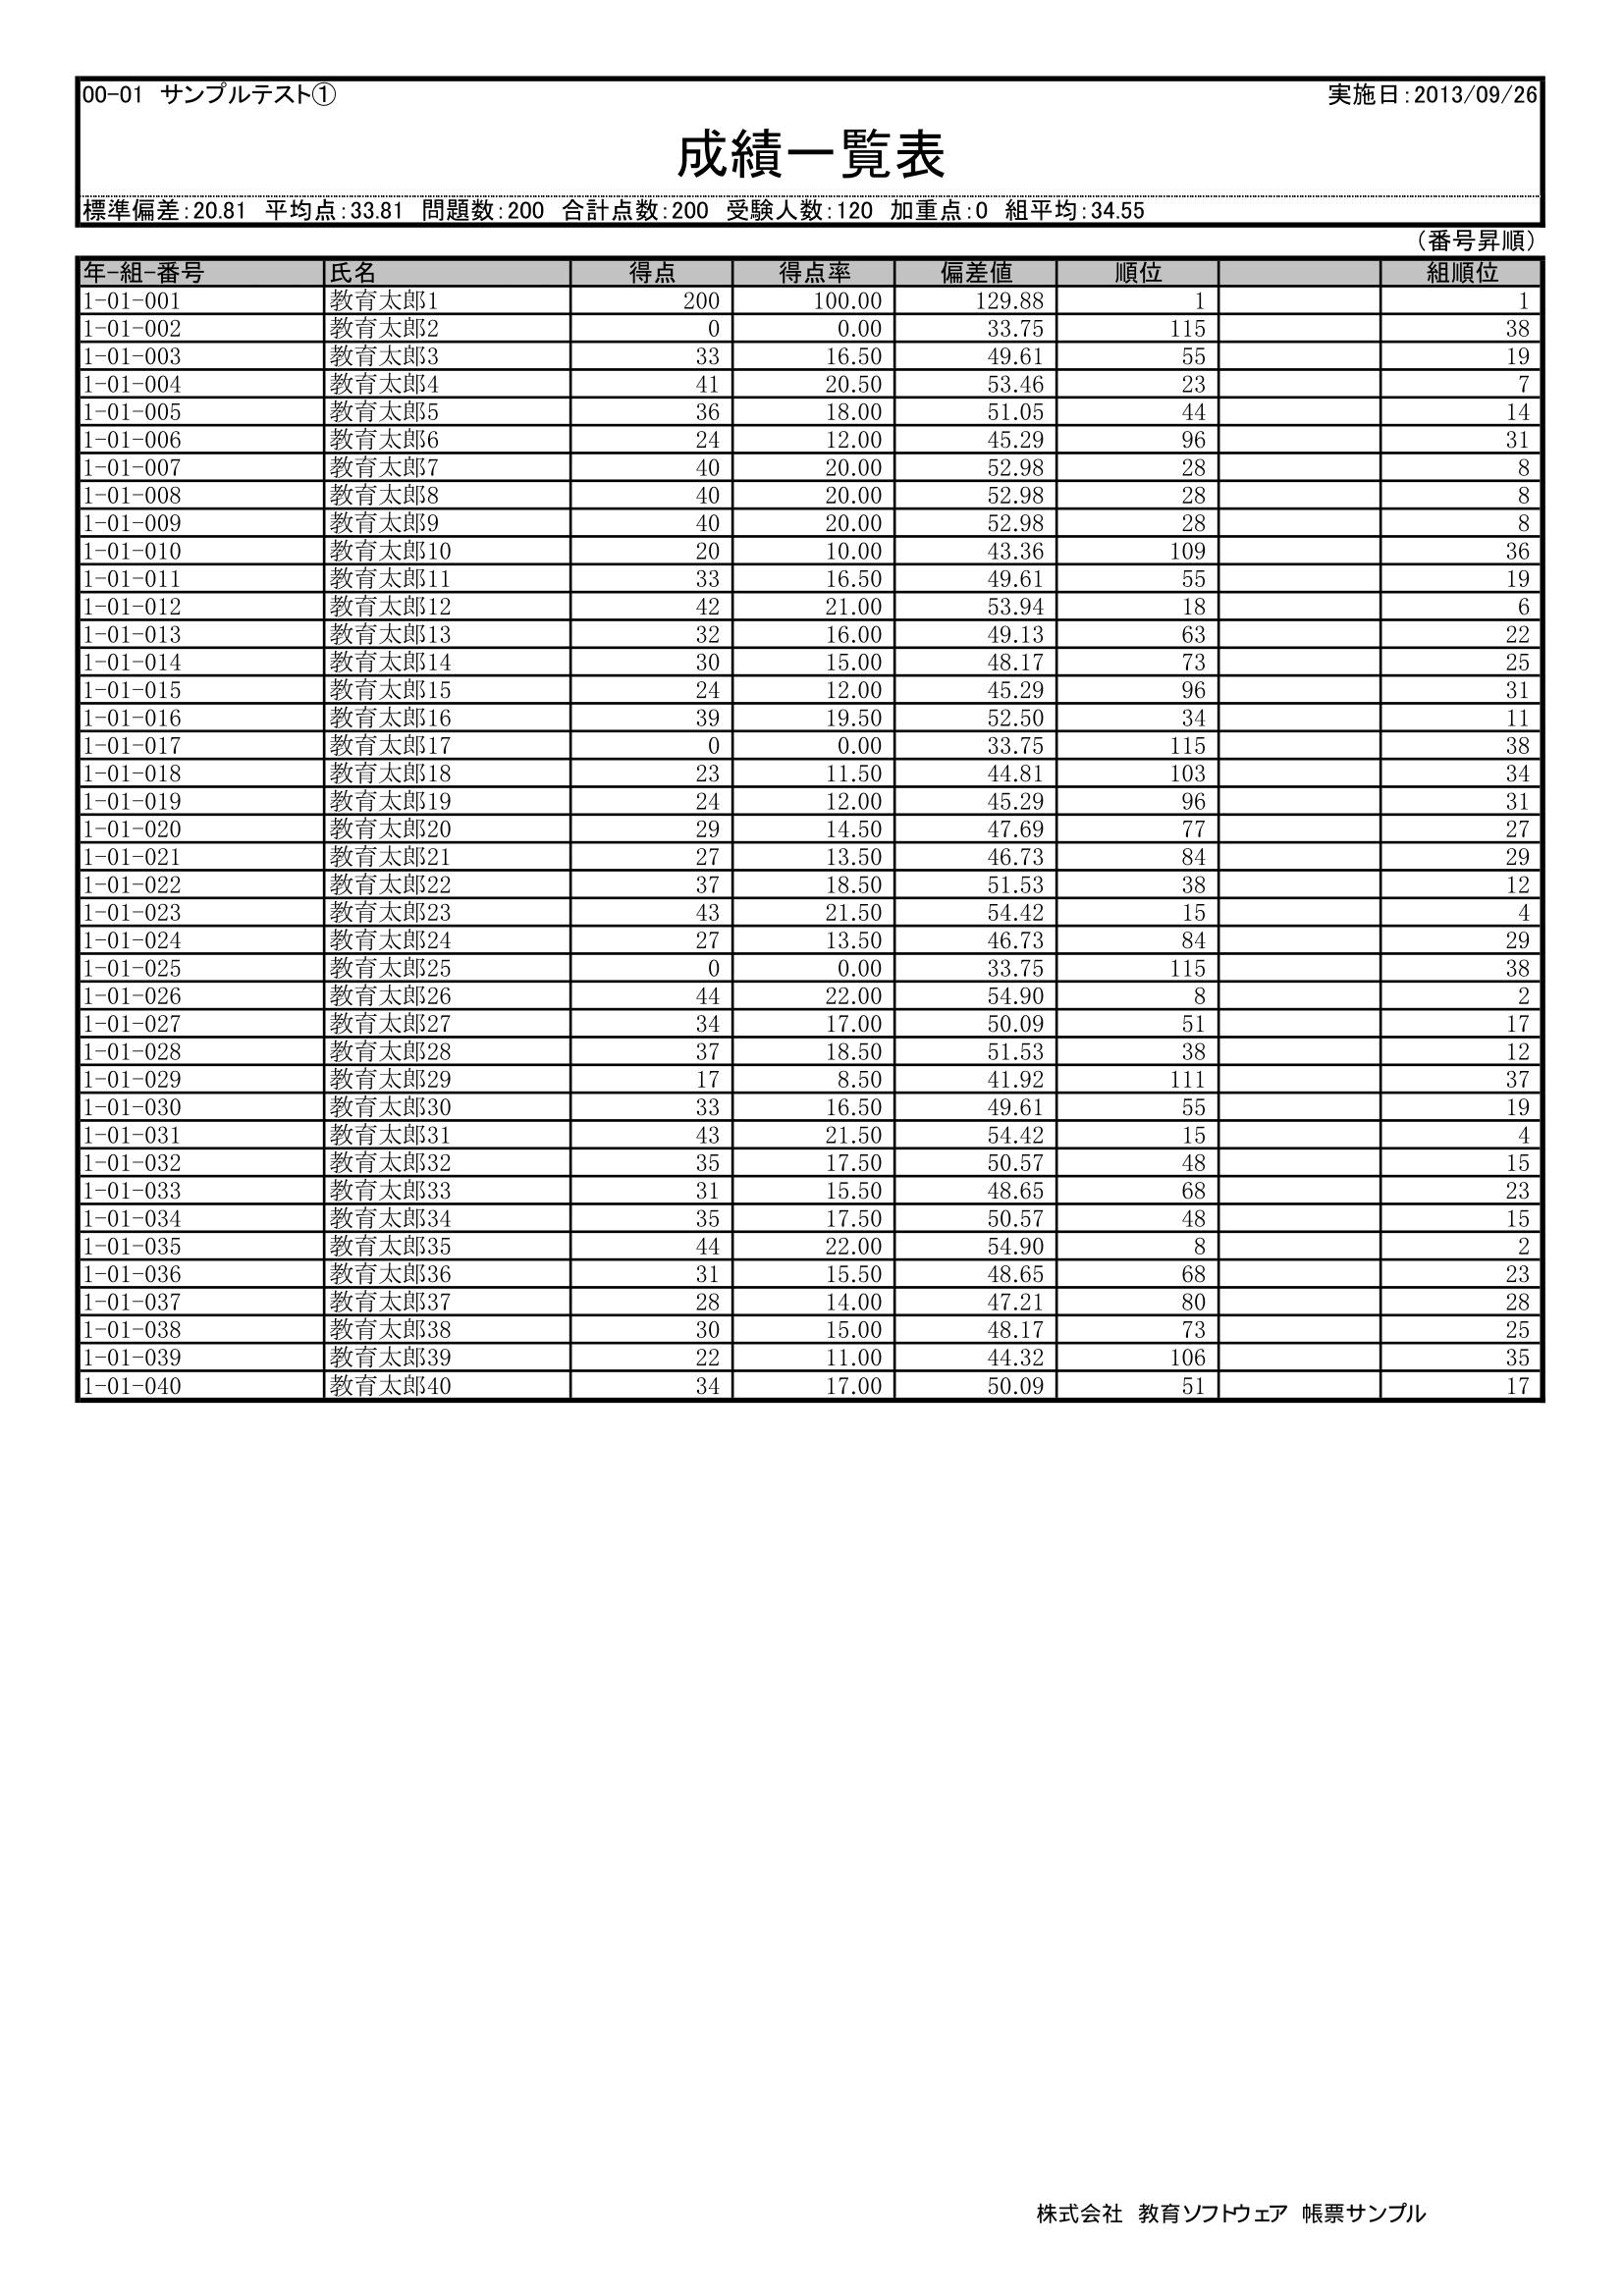 採点ソフト帳票-成績一覧表